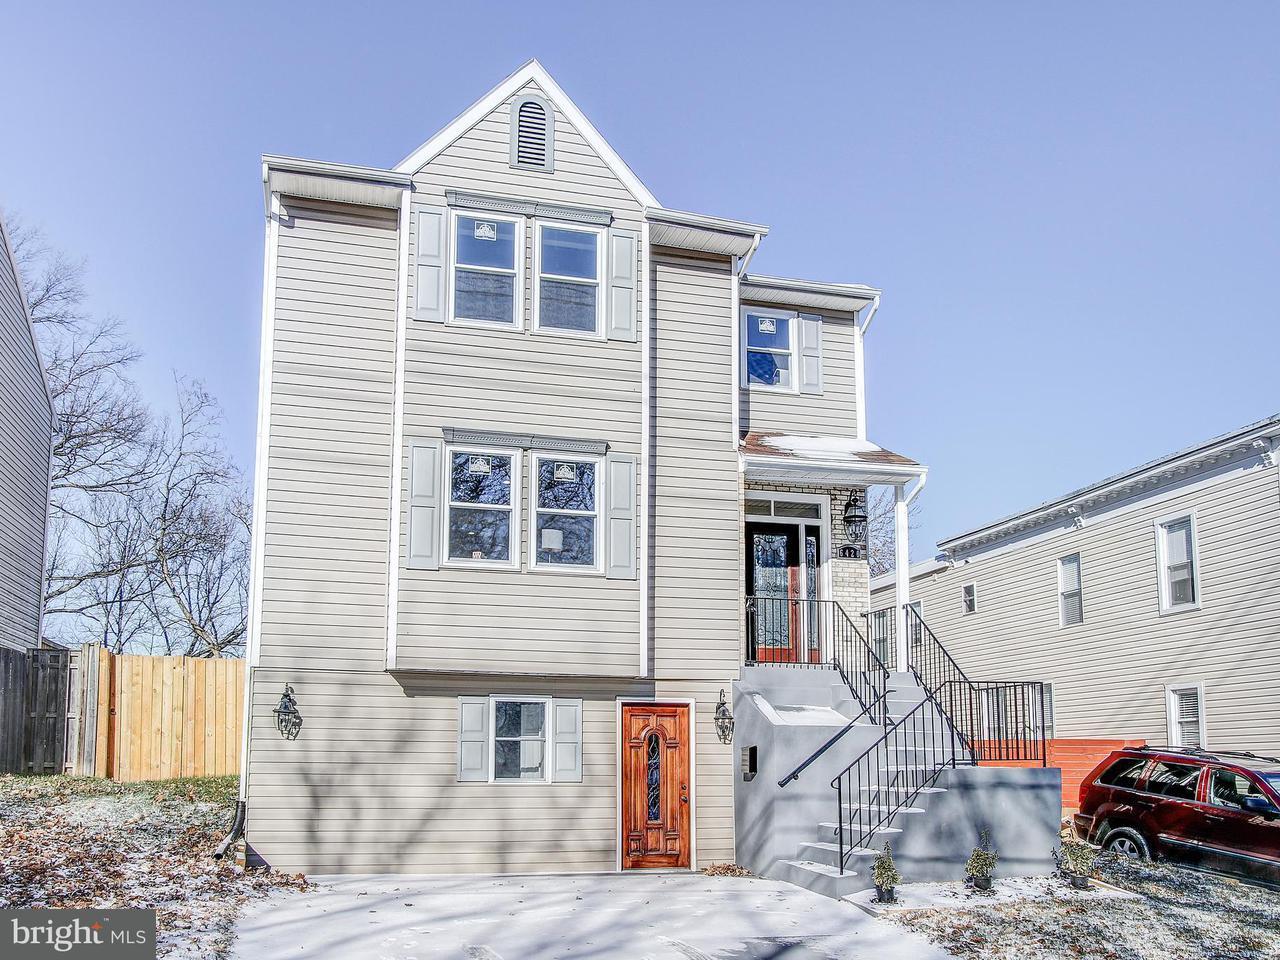 Single Family Home for Sale at 6420 SLIGO MILL Road 6420 SLIGO MILL Road Takoma Park, Maryland 20912 United States